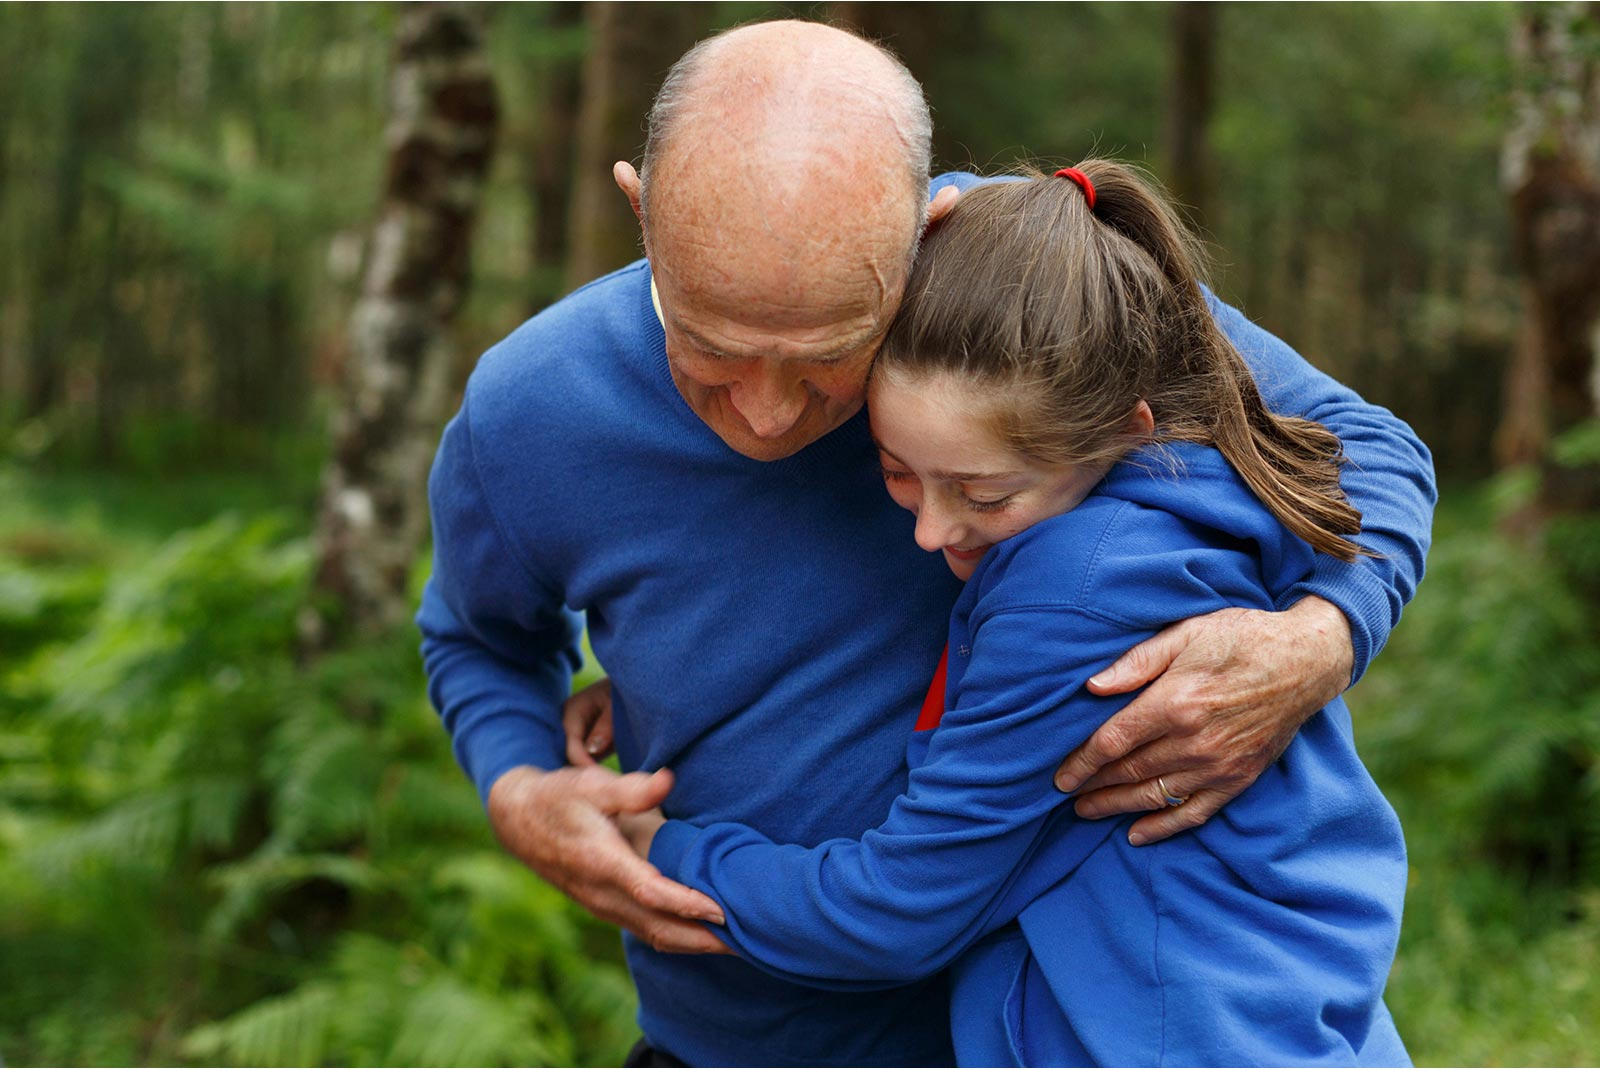 grandfather and grandchild embrase